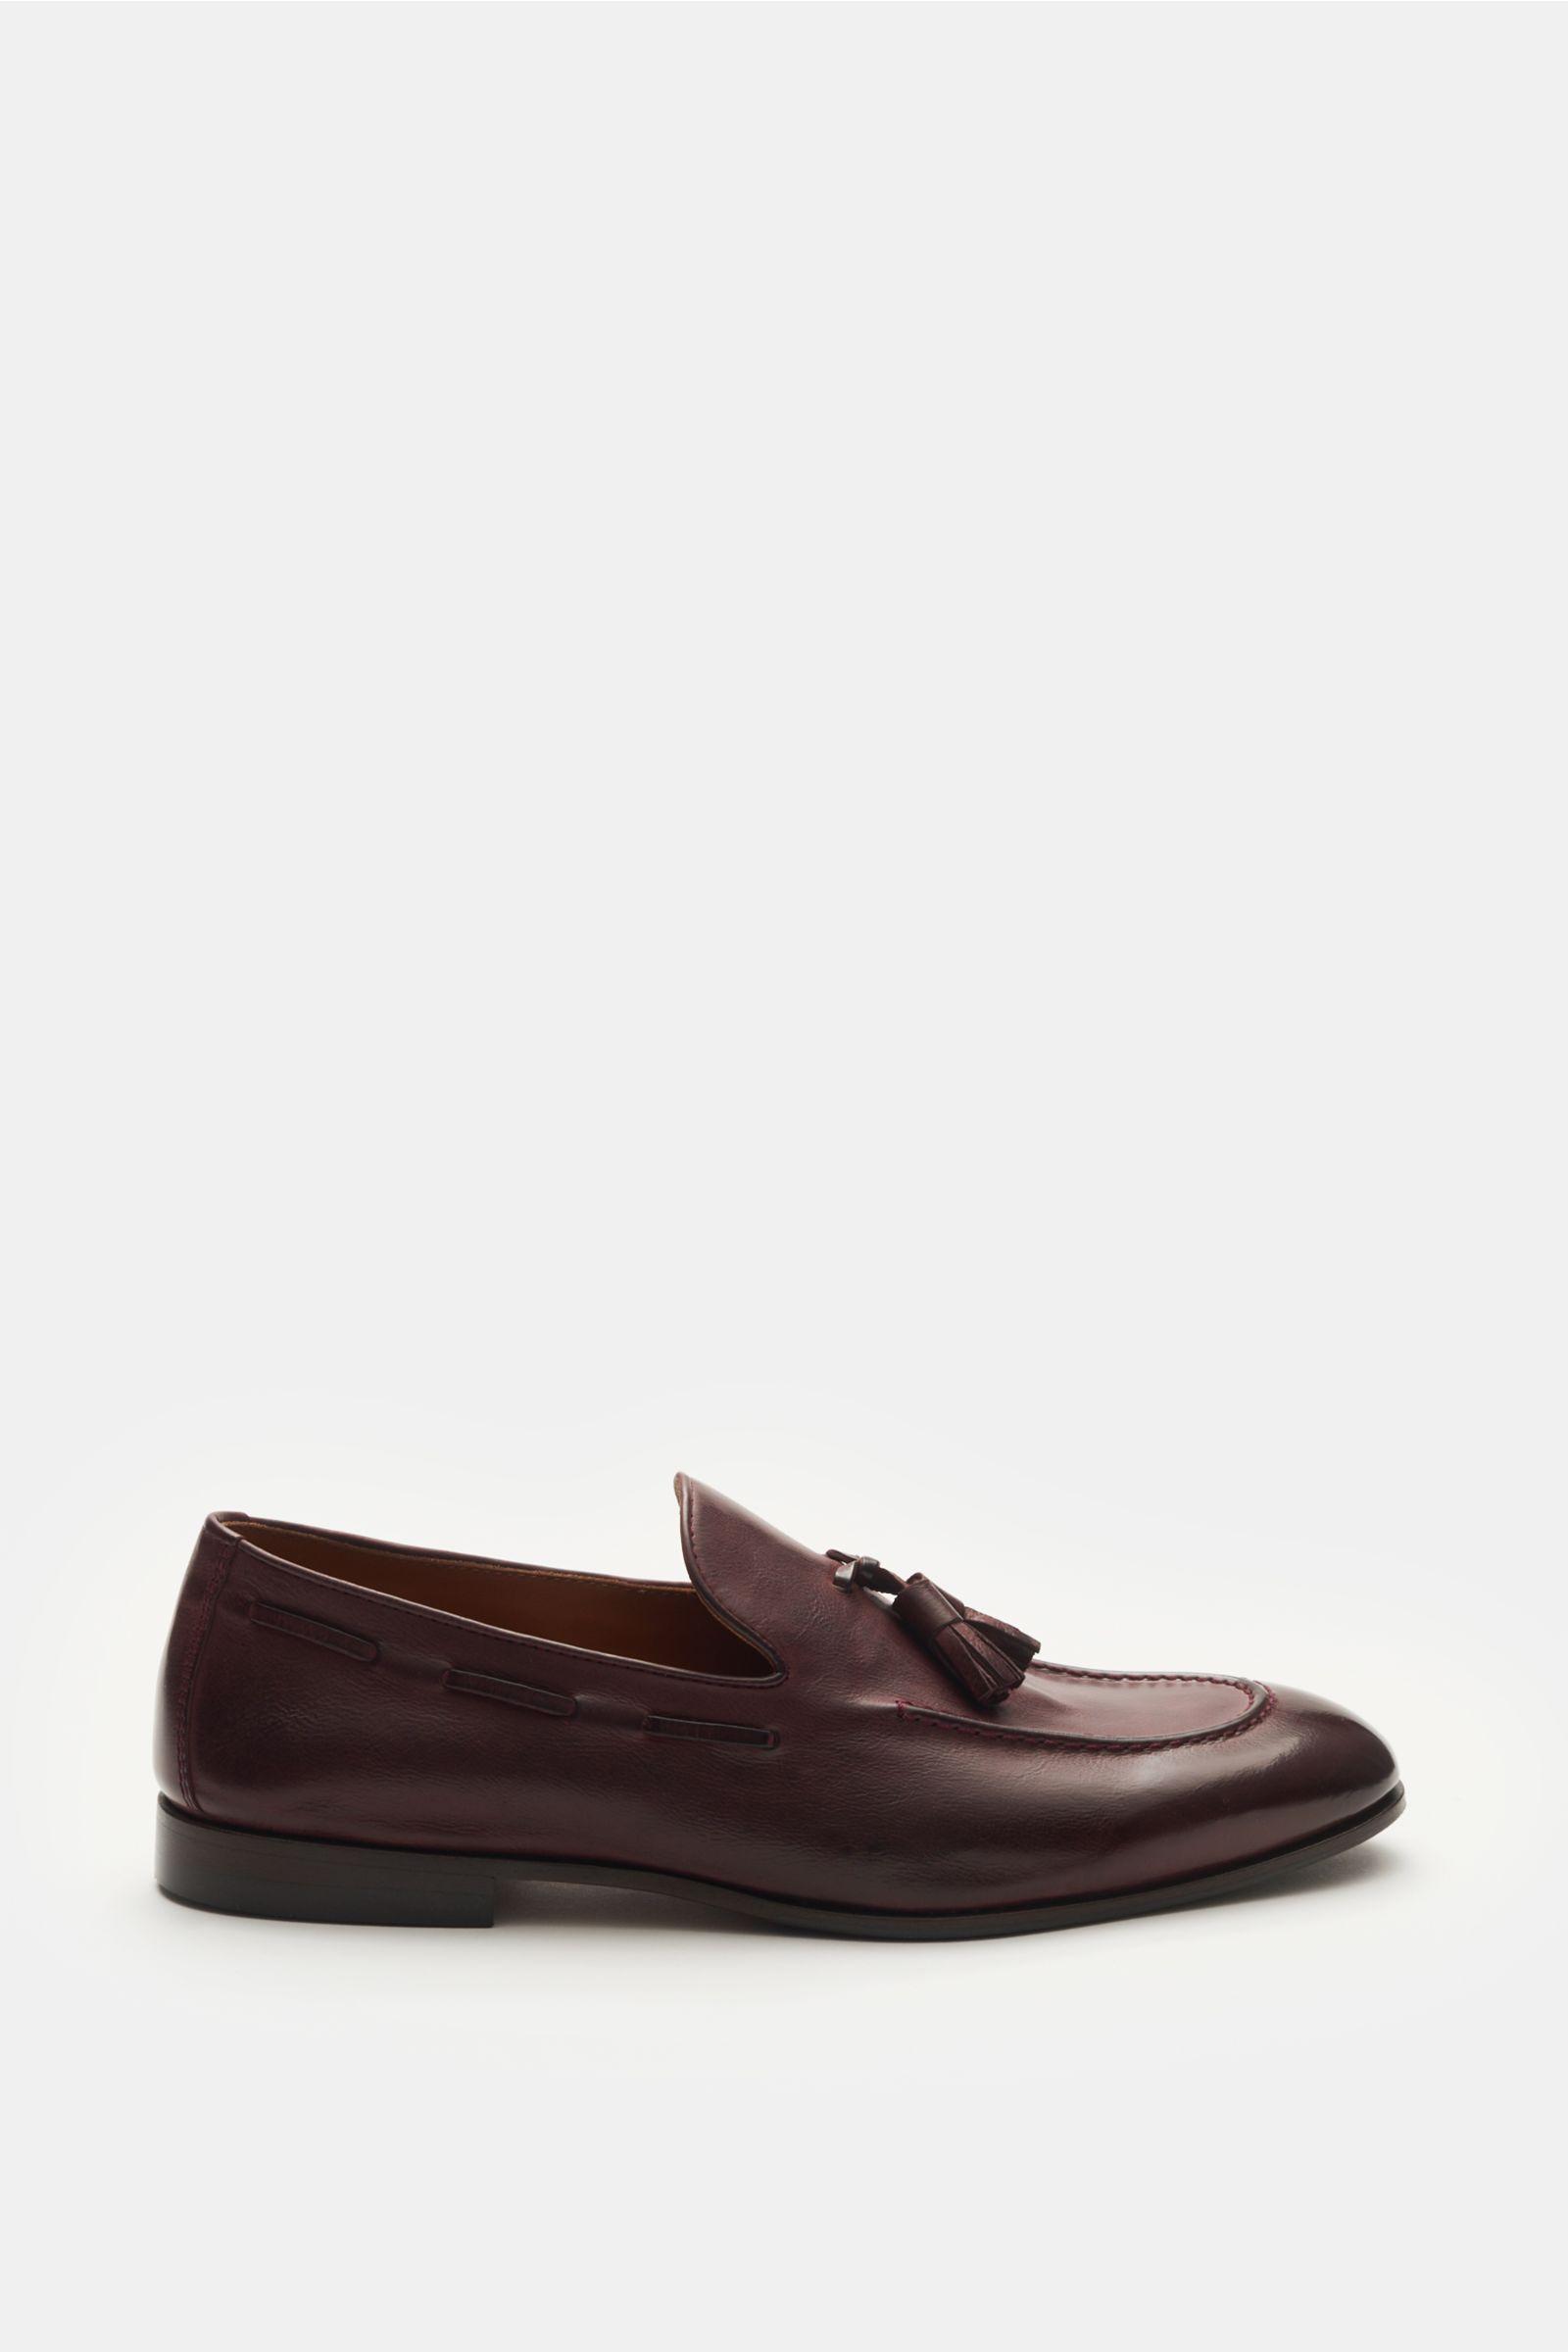 Tassel Loafer bordeaux